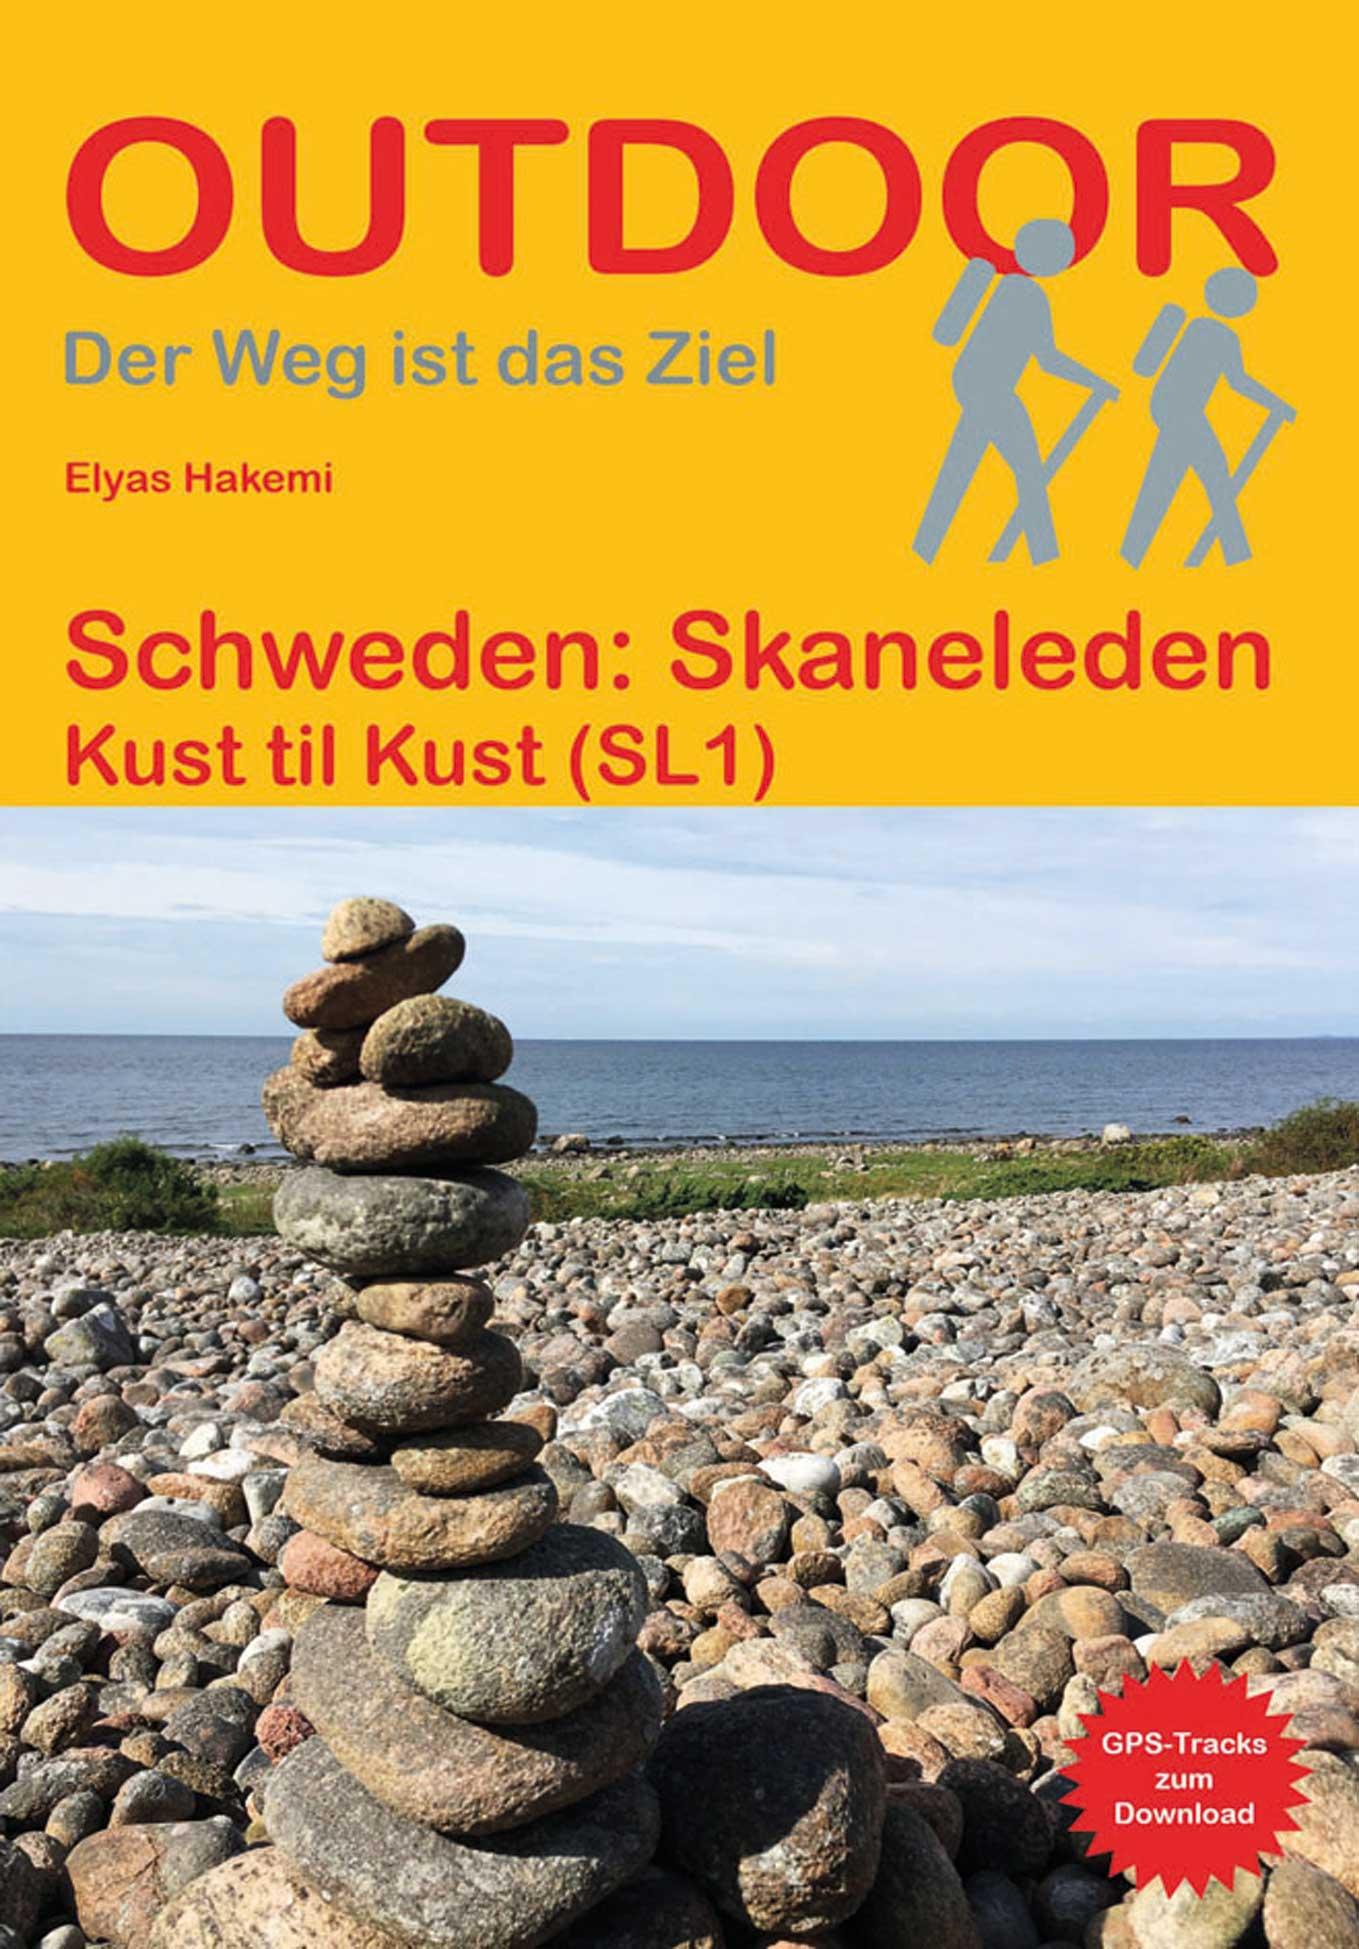 Schweden: Skåneleden Kust til Kust (SL1)